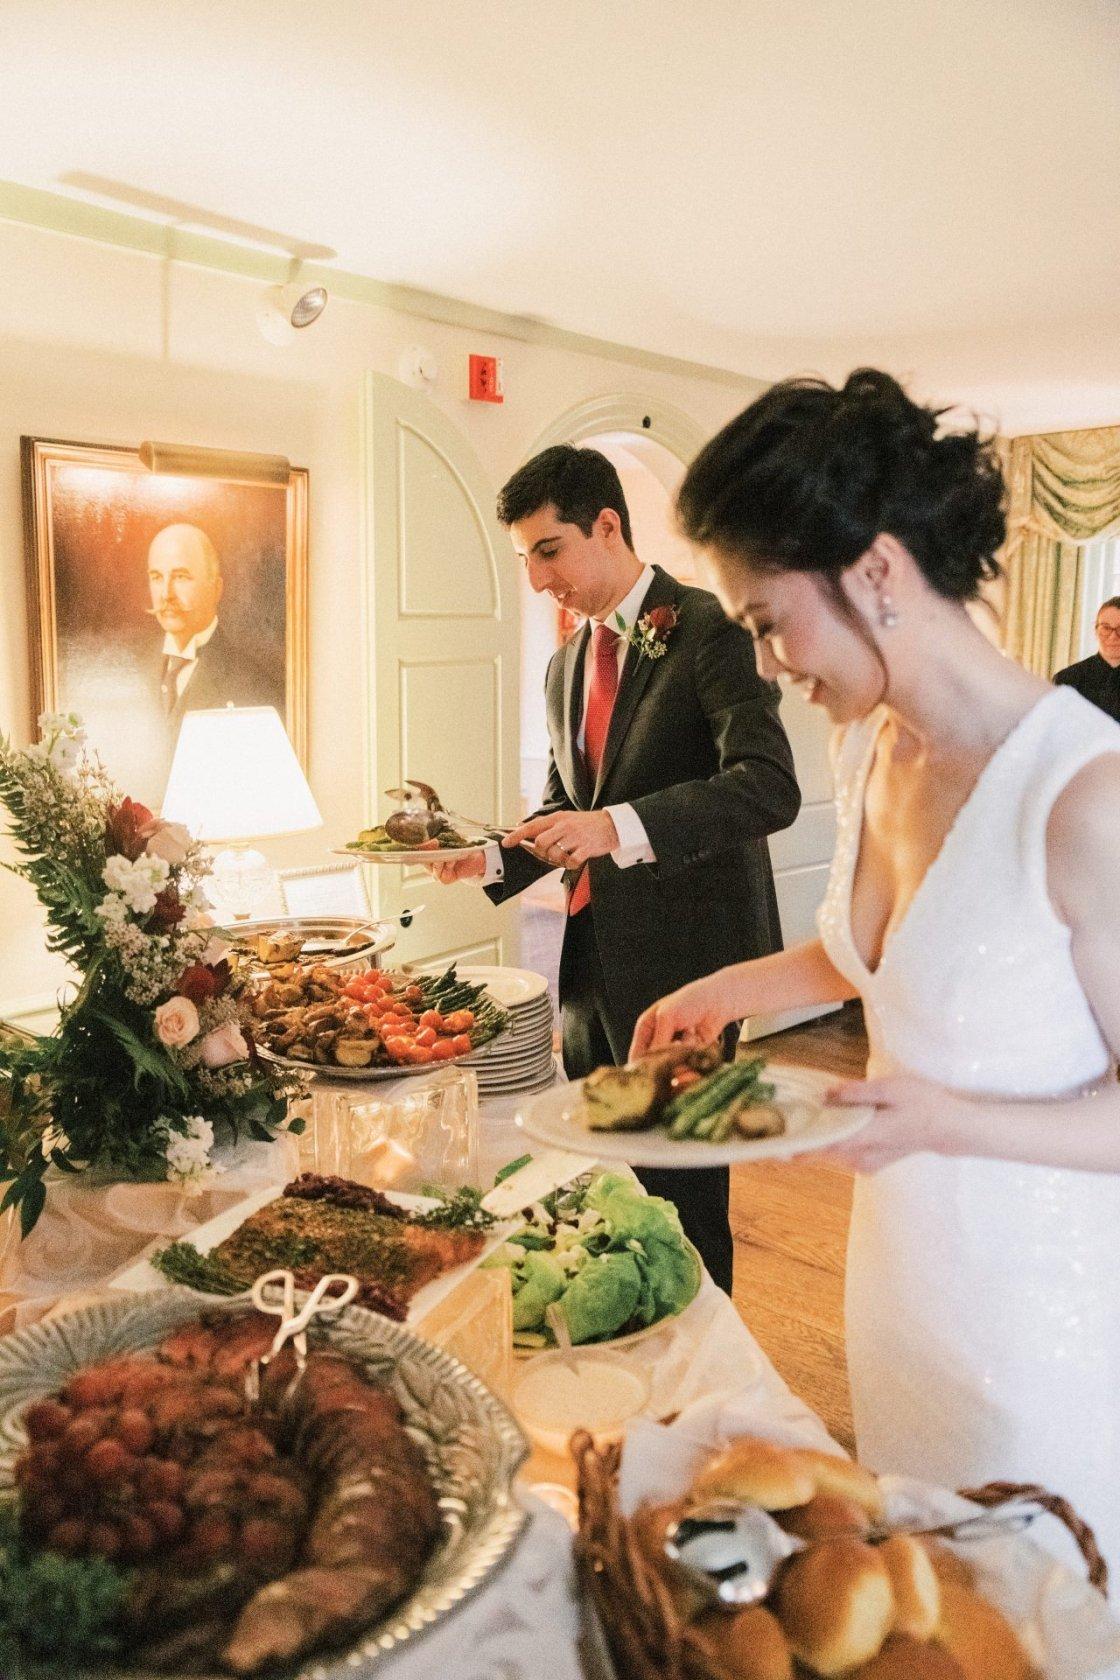 Buffet-Style Wedding Reception